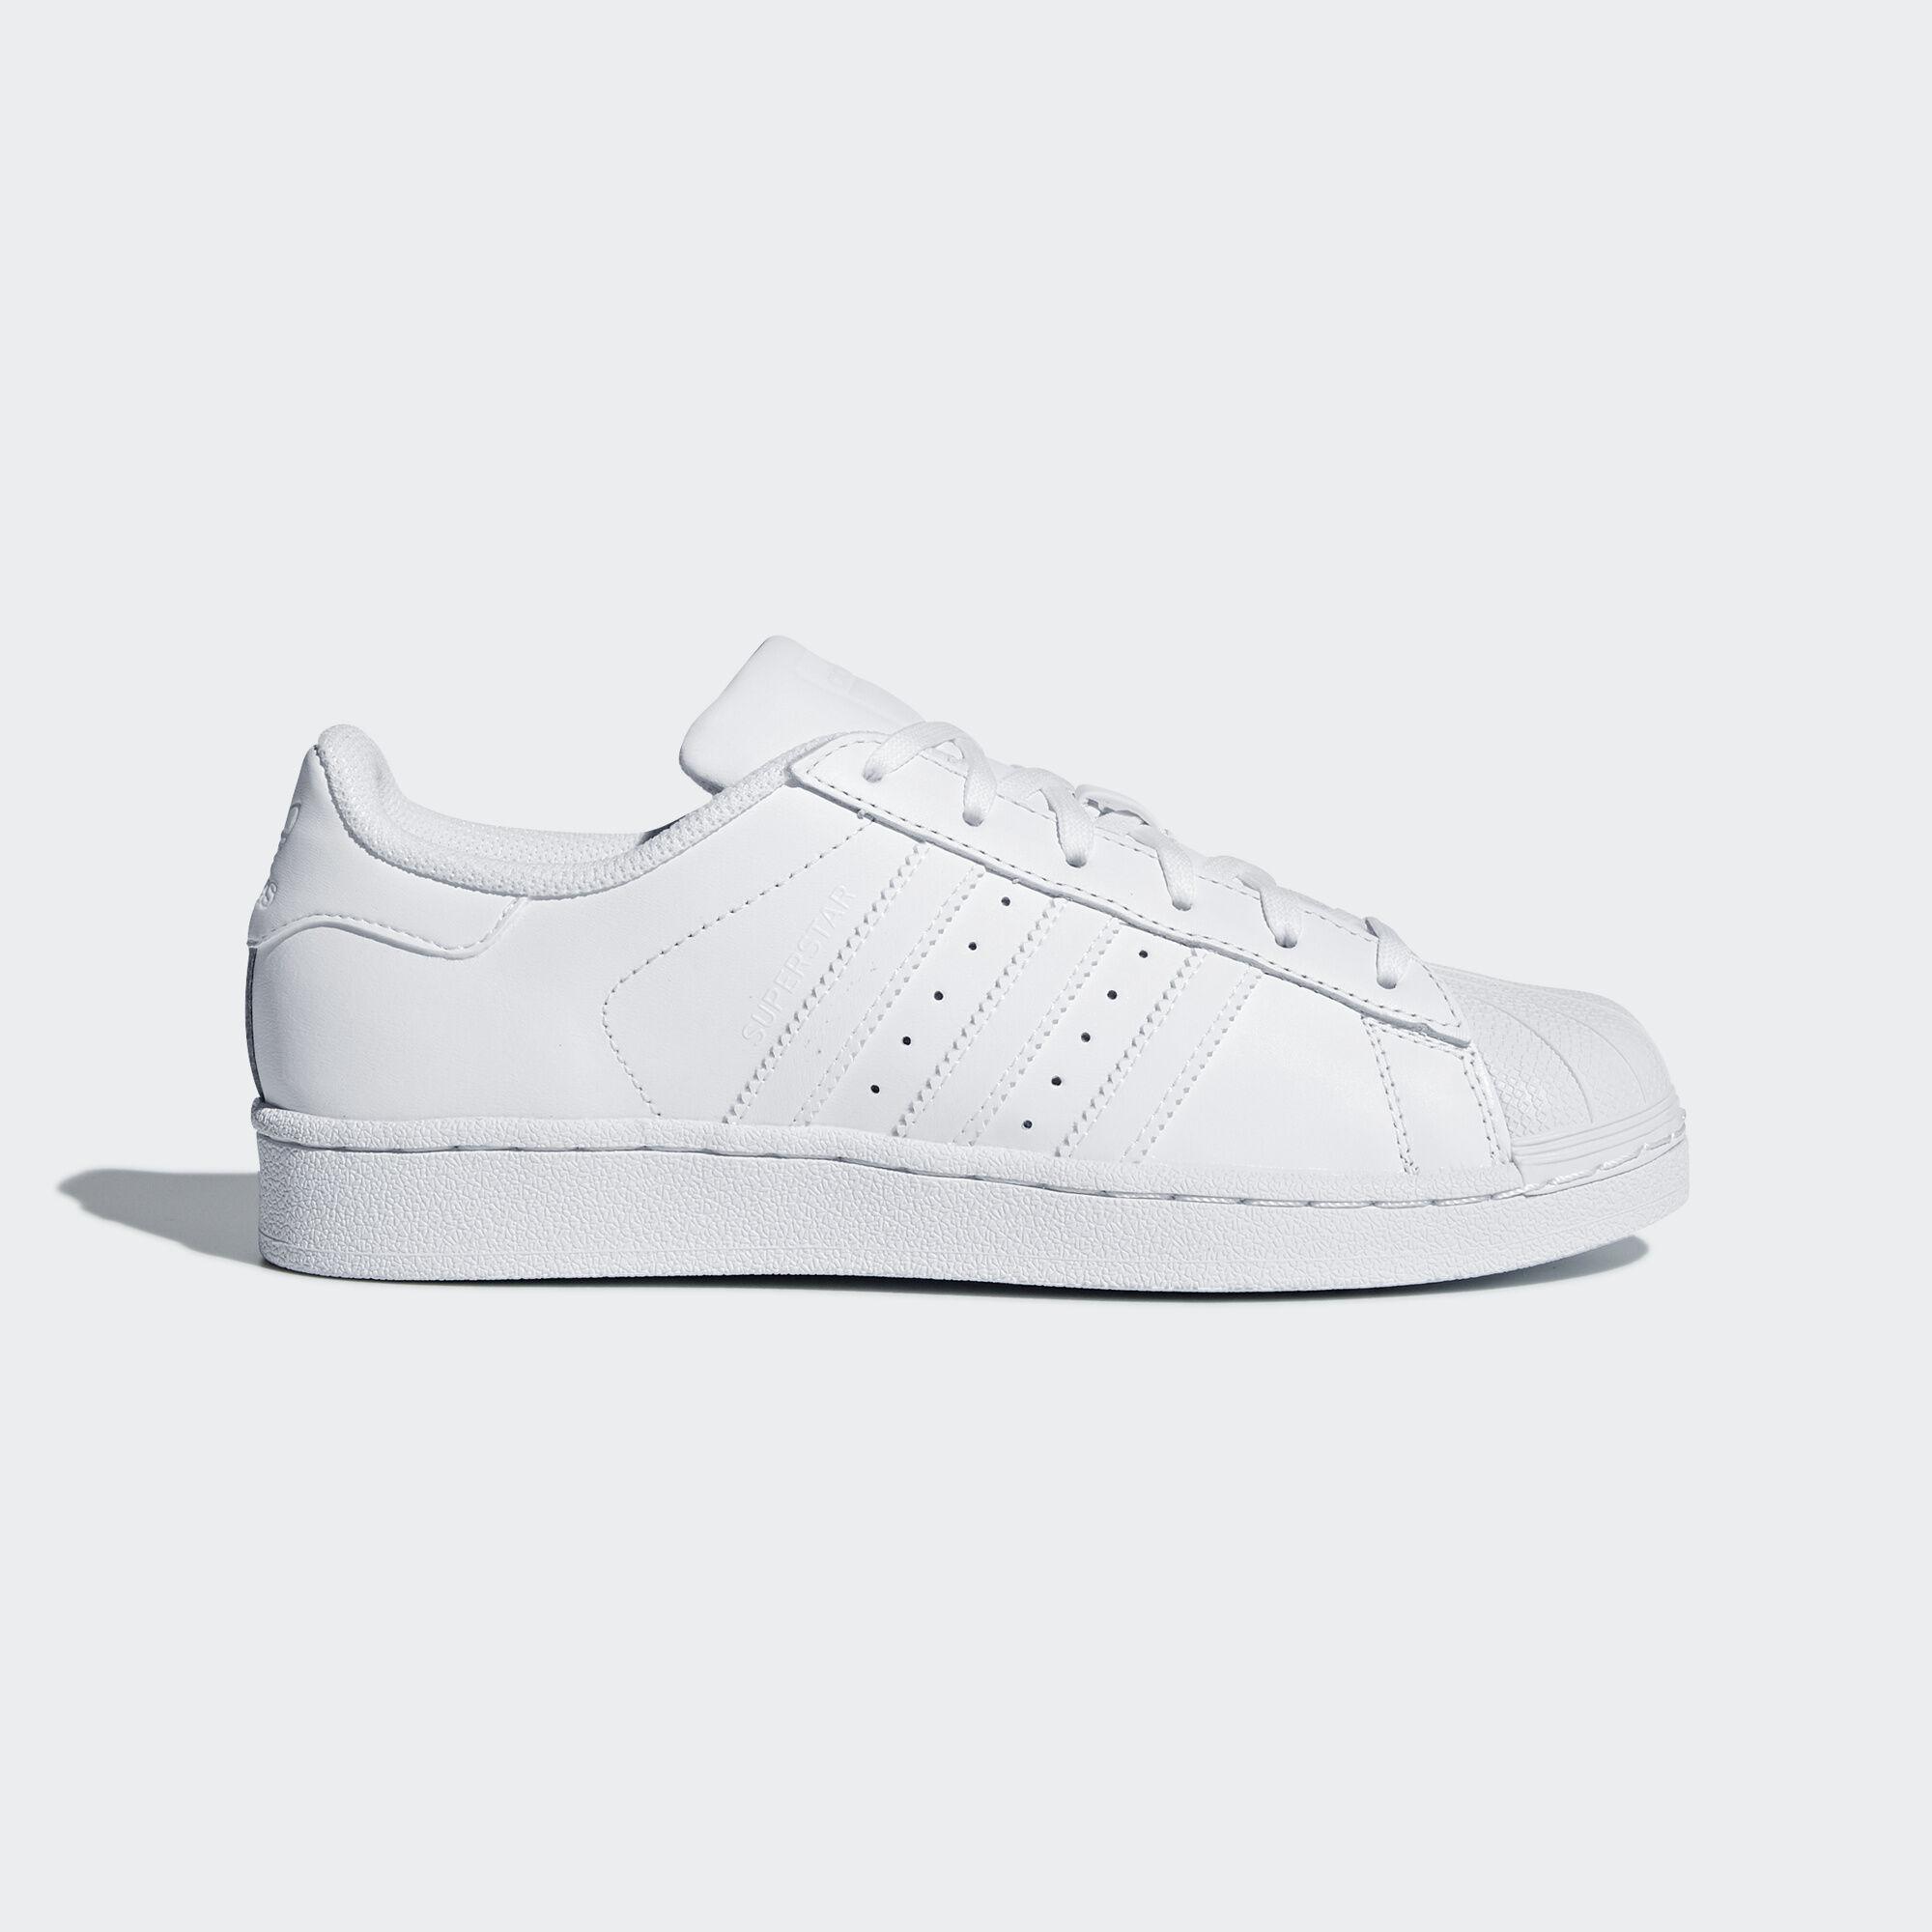 Adidas Superstar White Colour